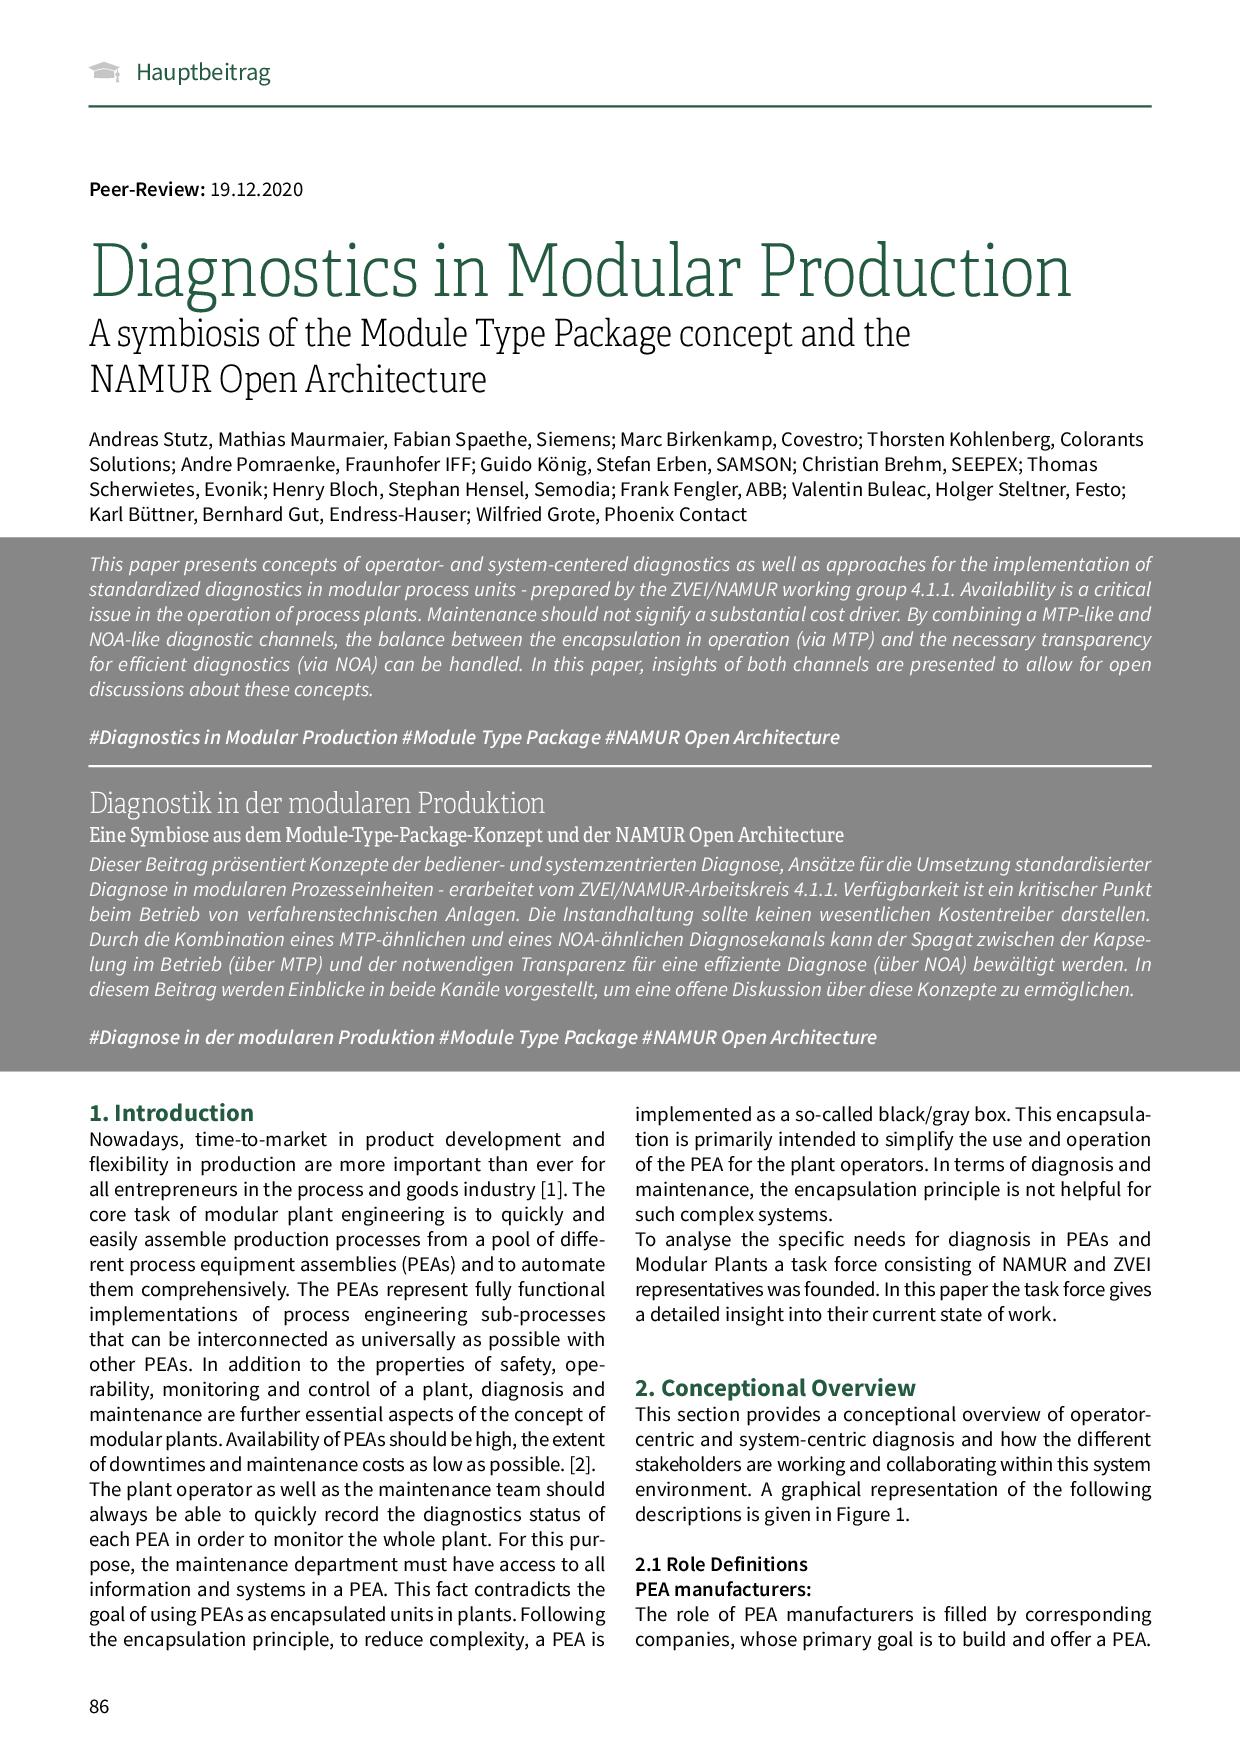 Diagnostics in Modular Production